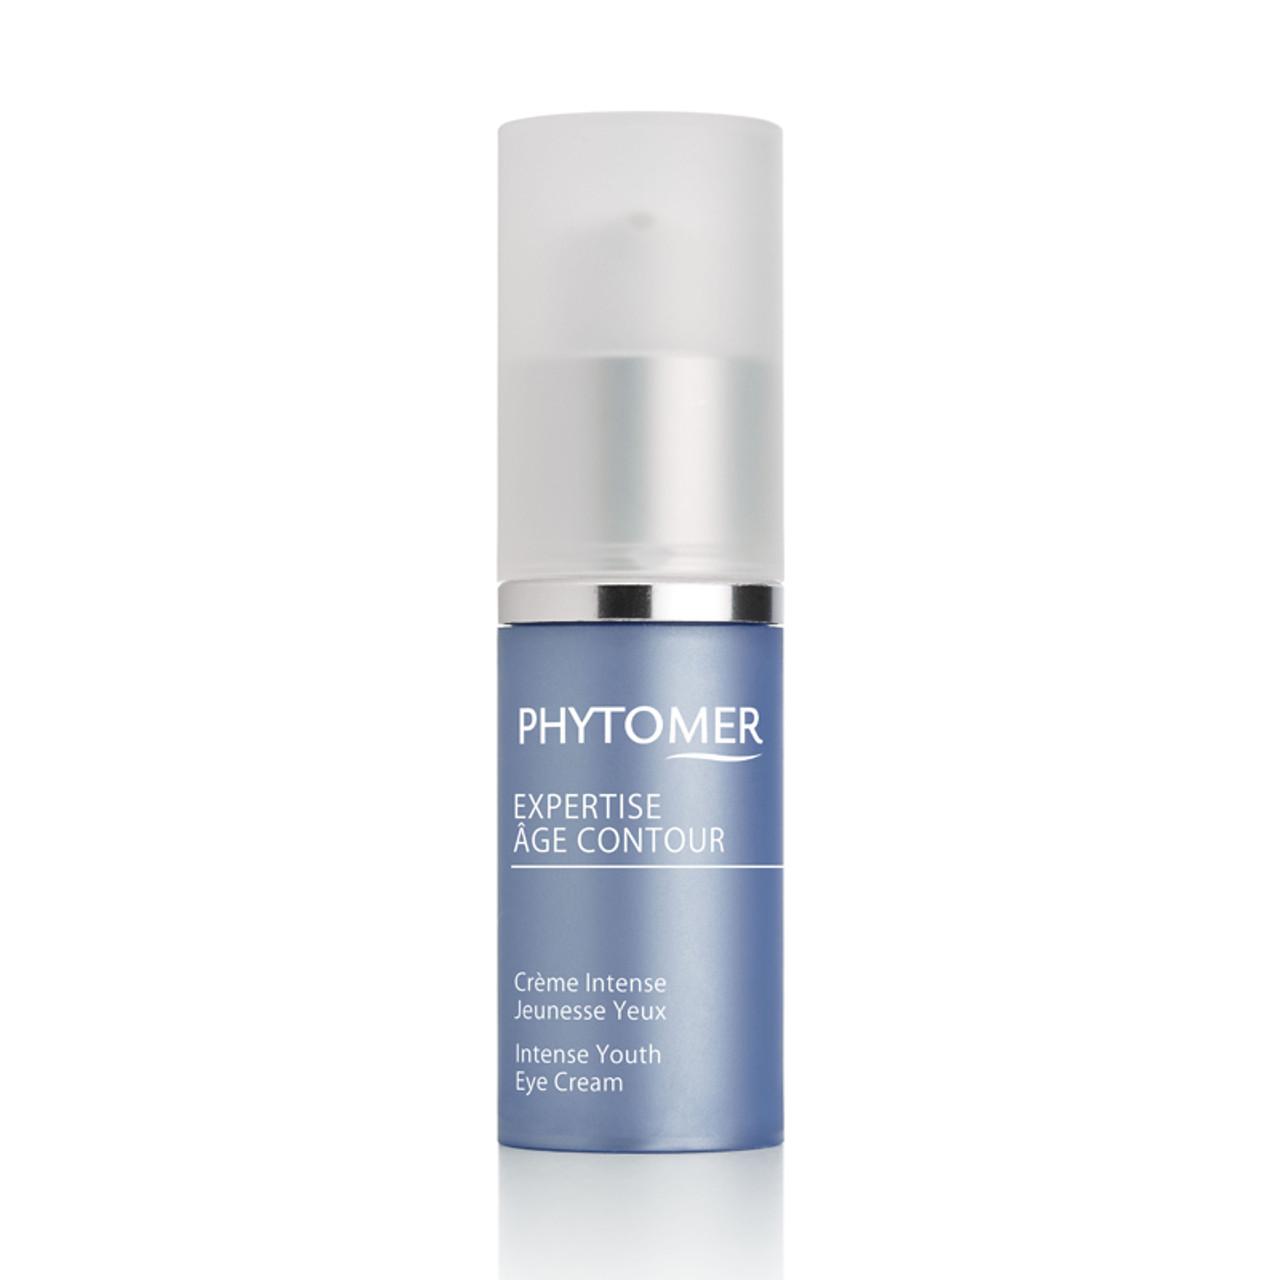 Phytomer Expertise Age Contour Intense Youth Eye Cream BeautifiedYou.com